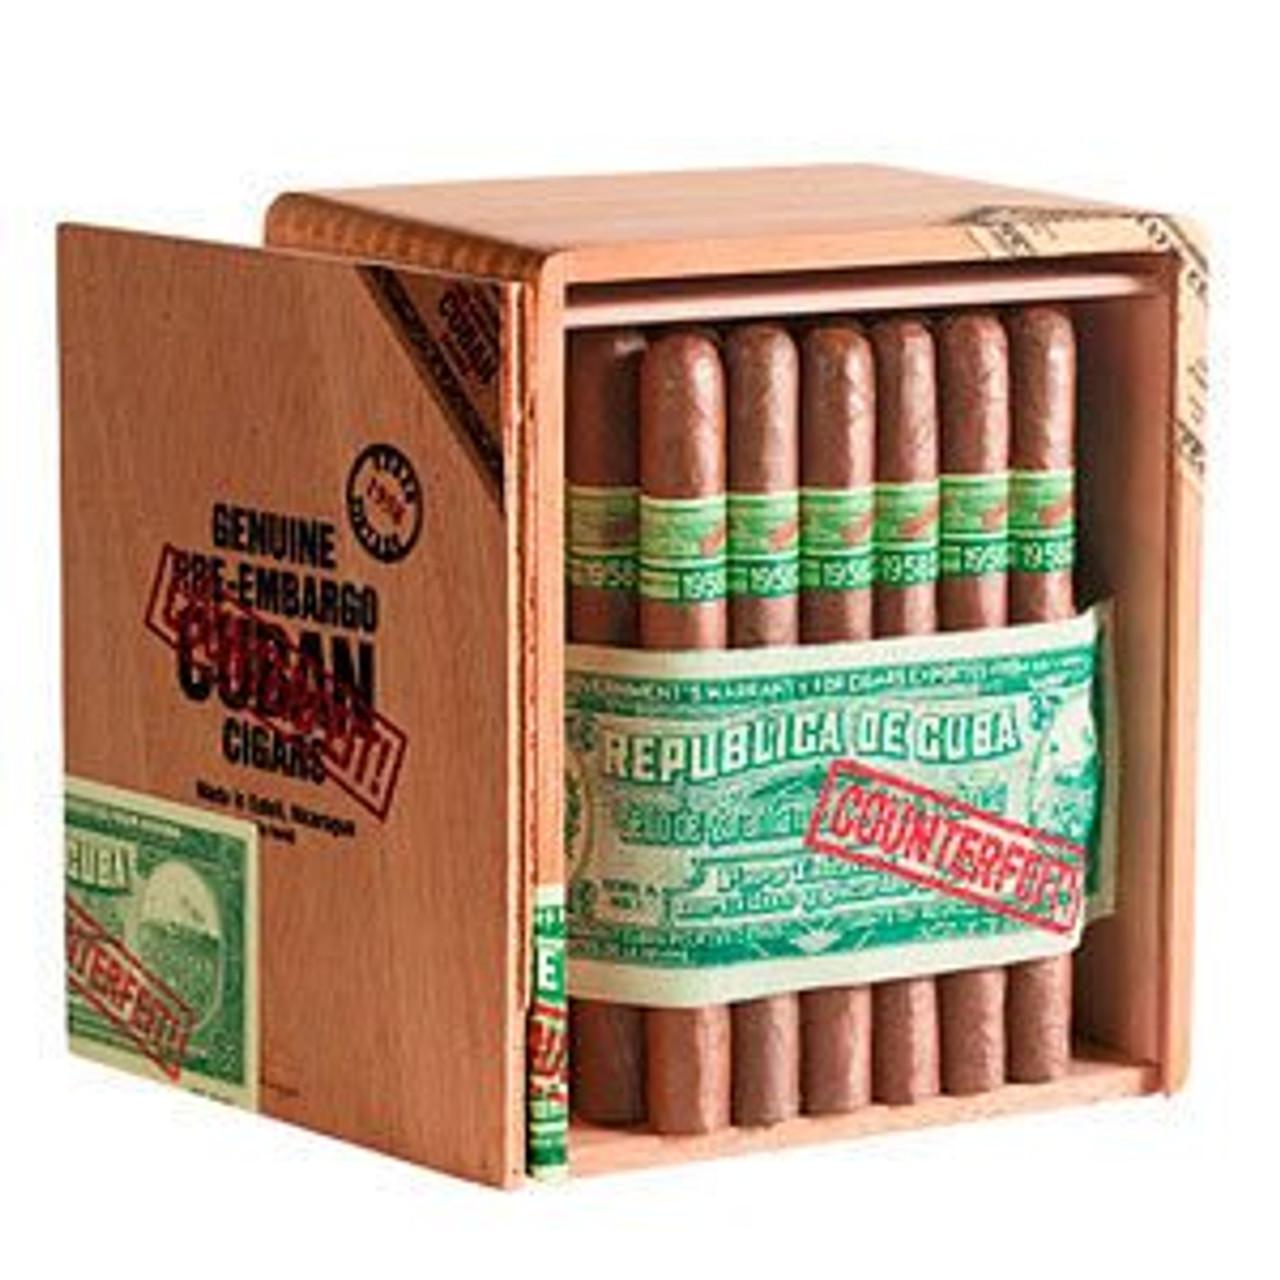 Genuine Pre-Embargo Counterfeit Cubans 1958 Corona Gorda Cigars - 6 x 50 (Box of 25)